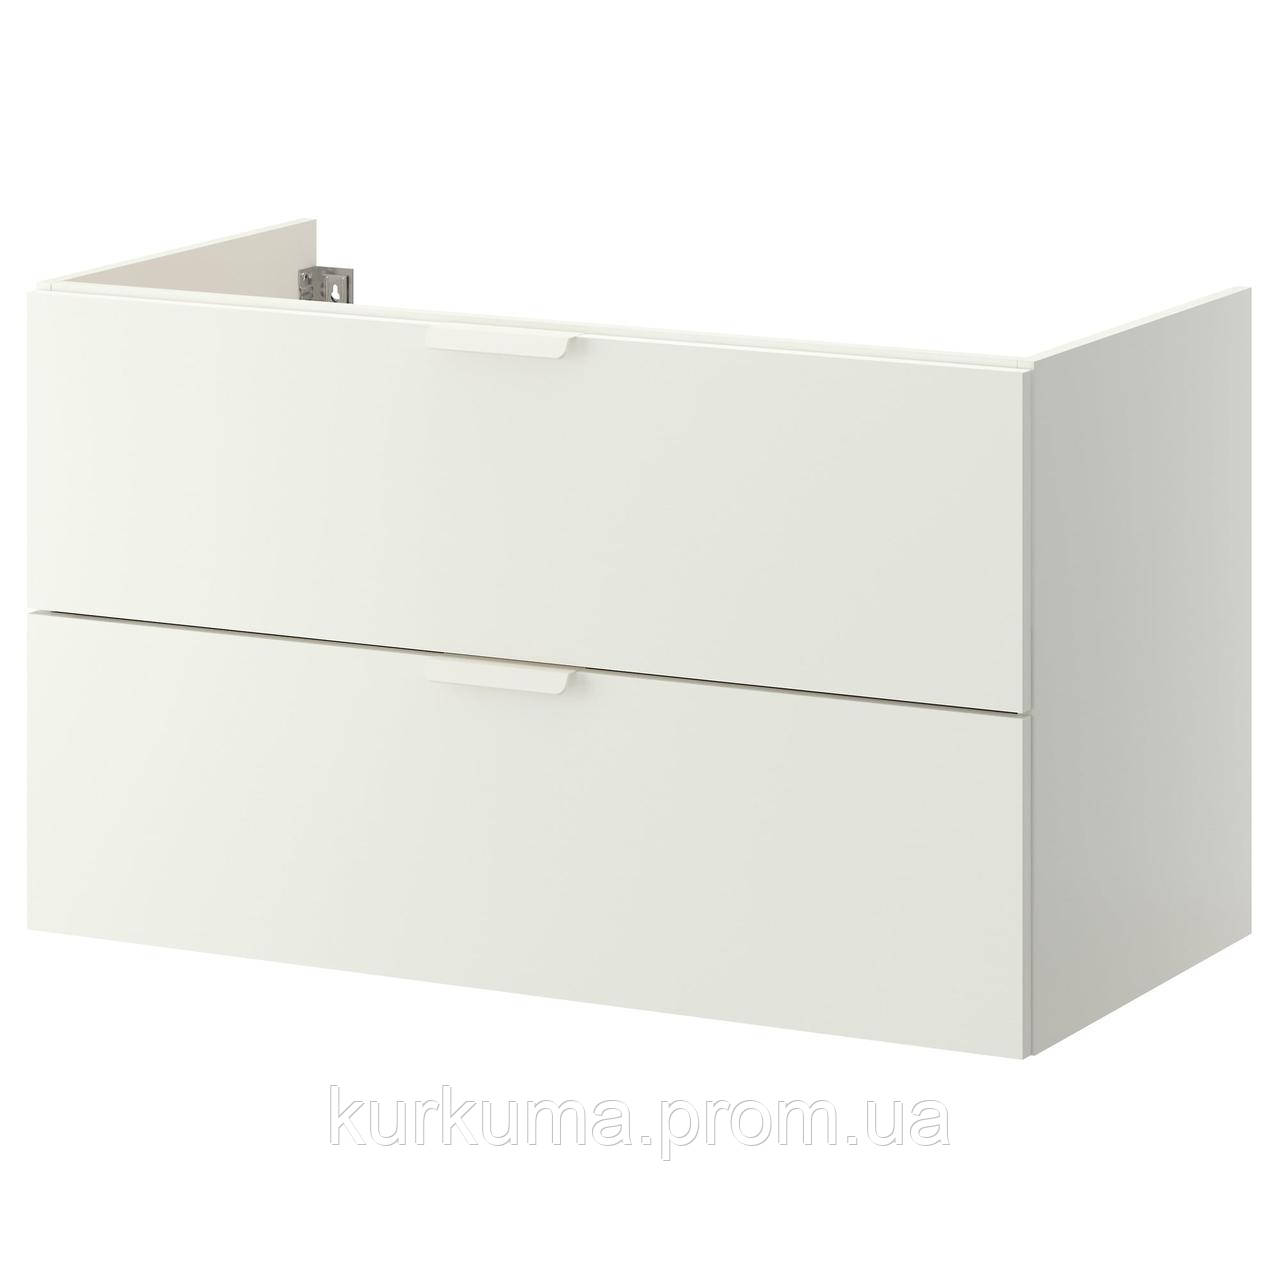 IKEA GODMORGON Шкаф под умывальник, белый  (003.441.06)